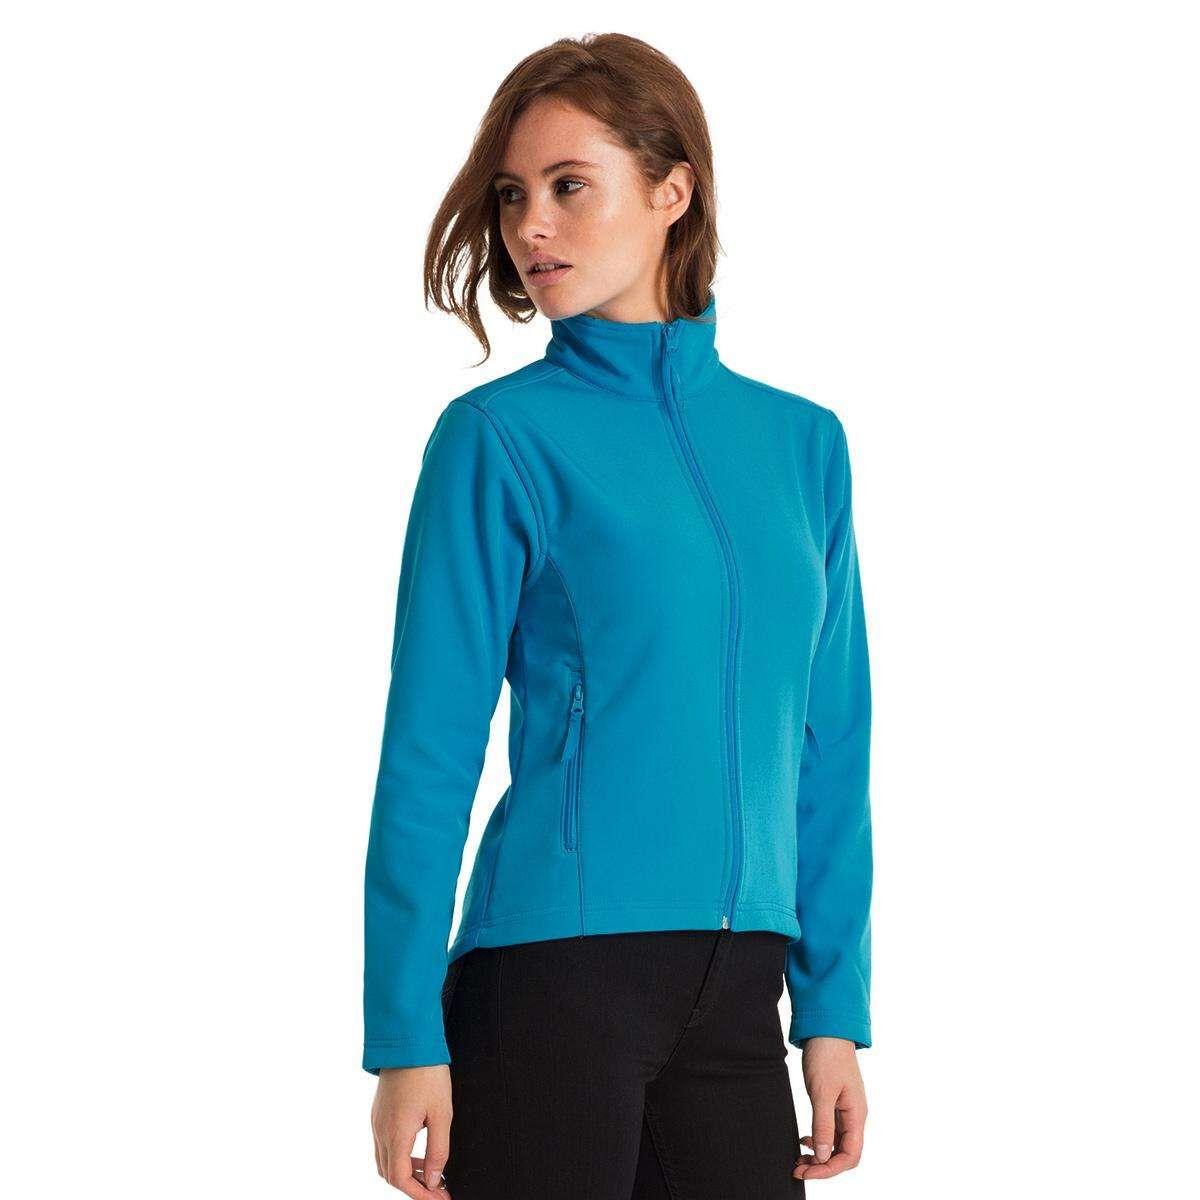 B&C Softshell Jacket Blue